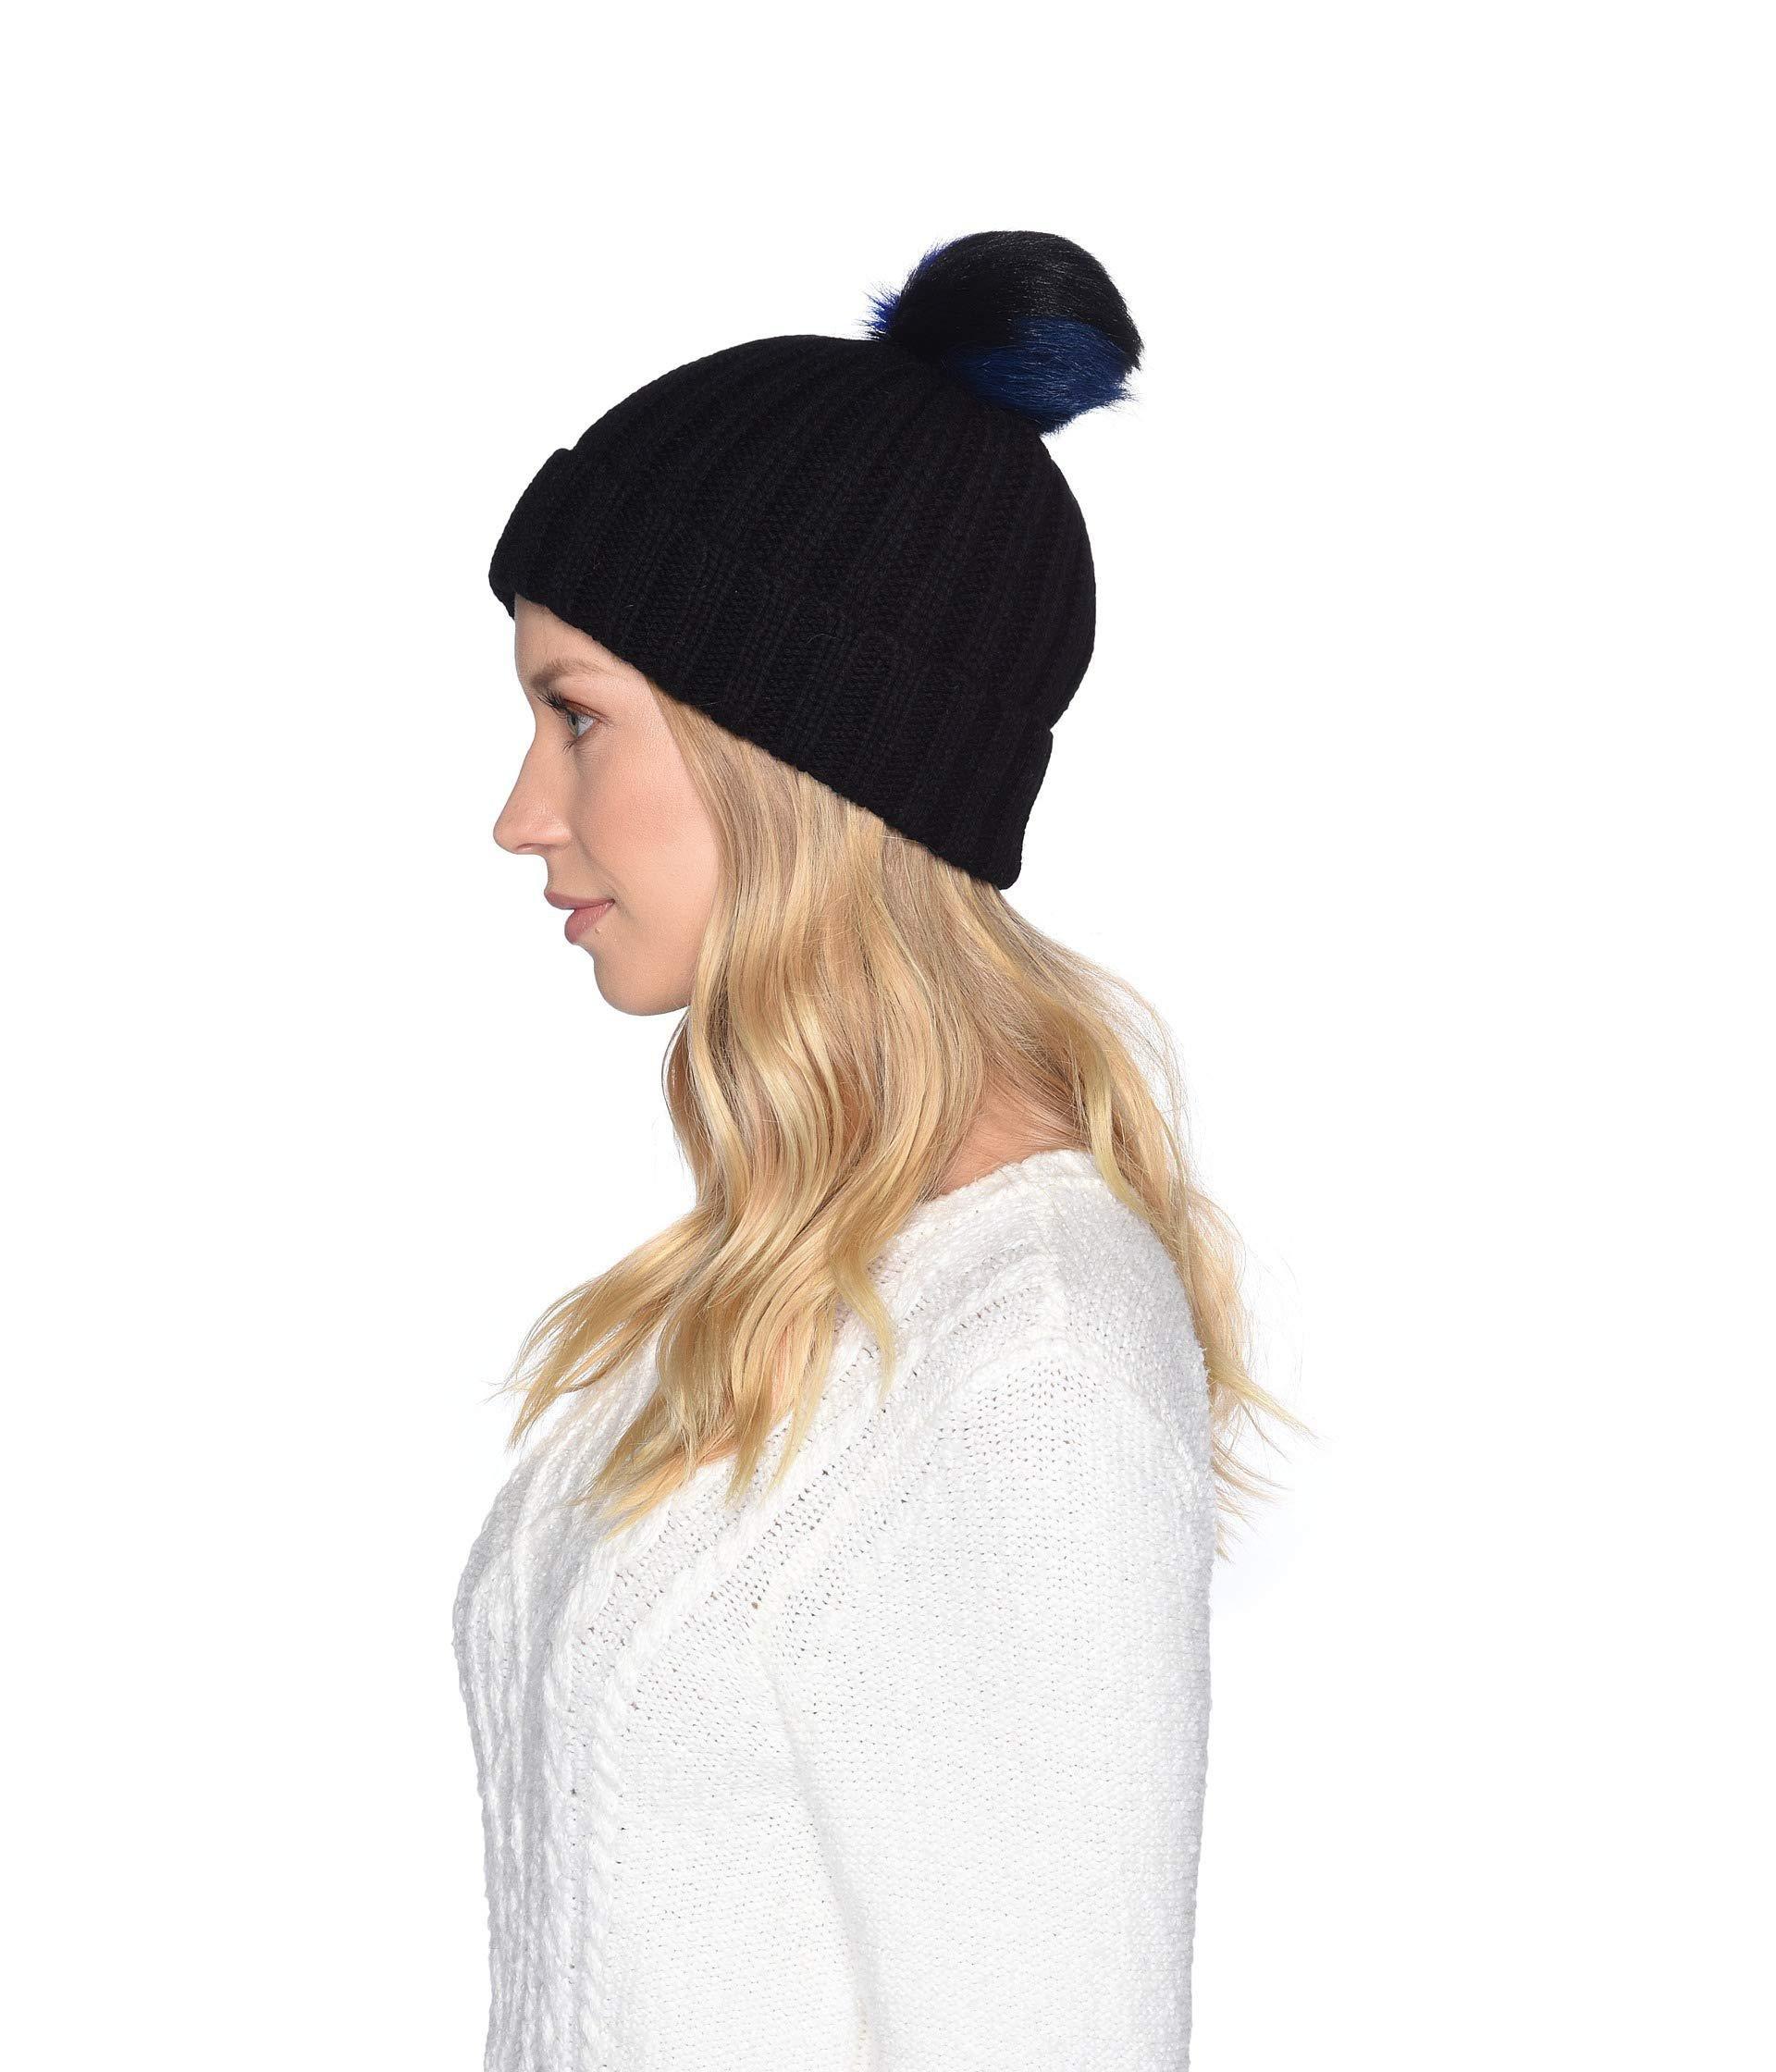 Lyst - UGG Multicolored Sheepskin Pom Knit Hat (black Multi) Caps in Black b50b30033e5f